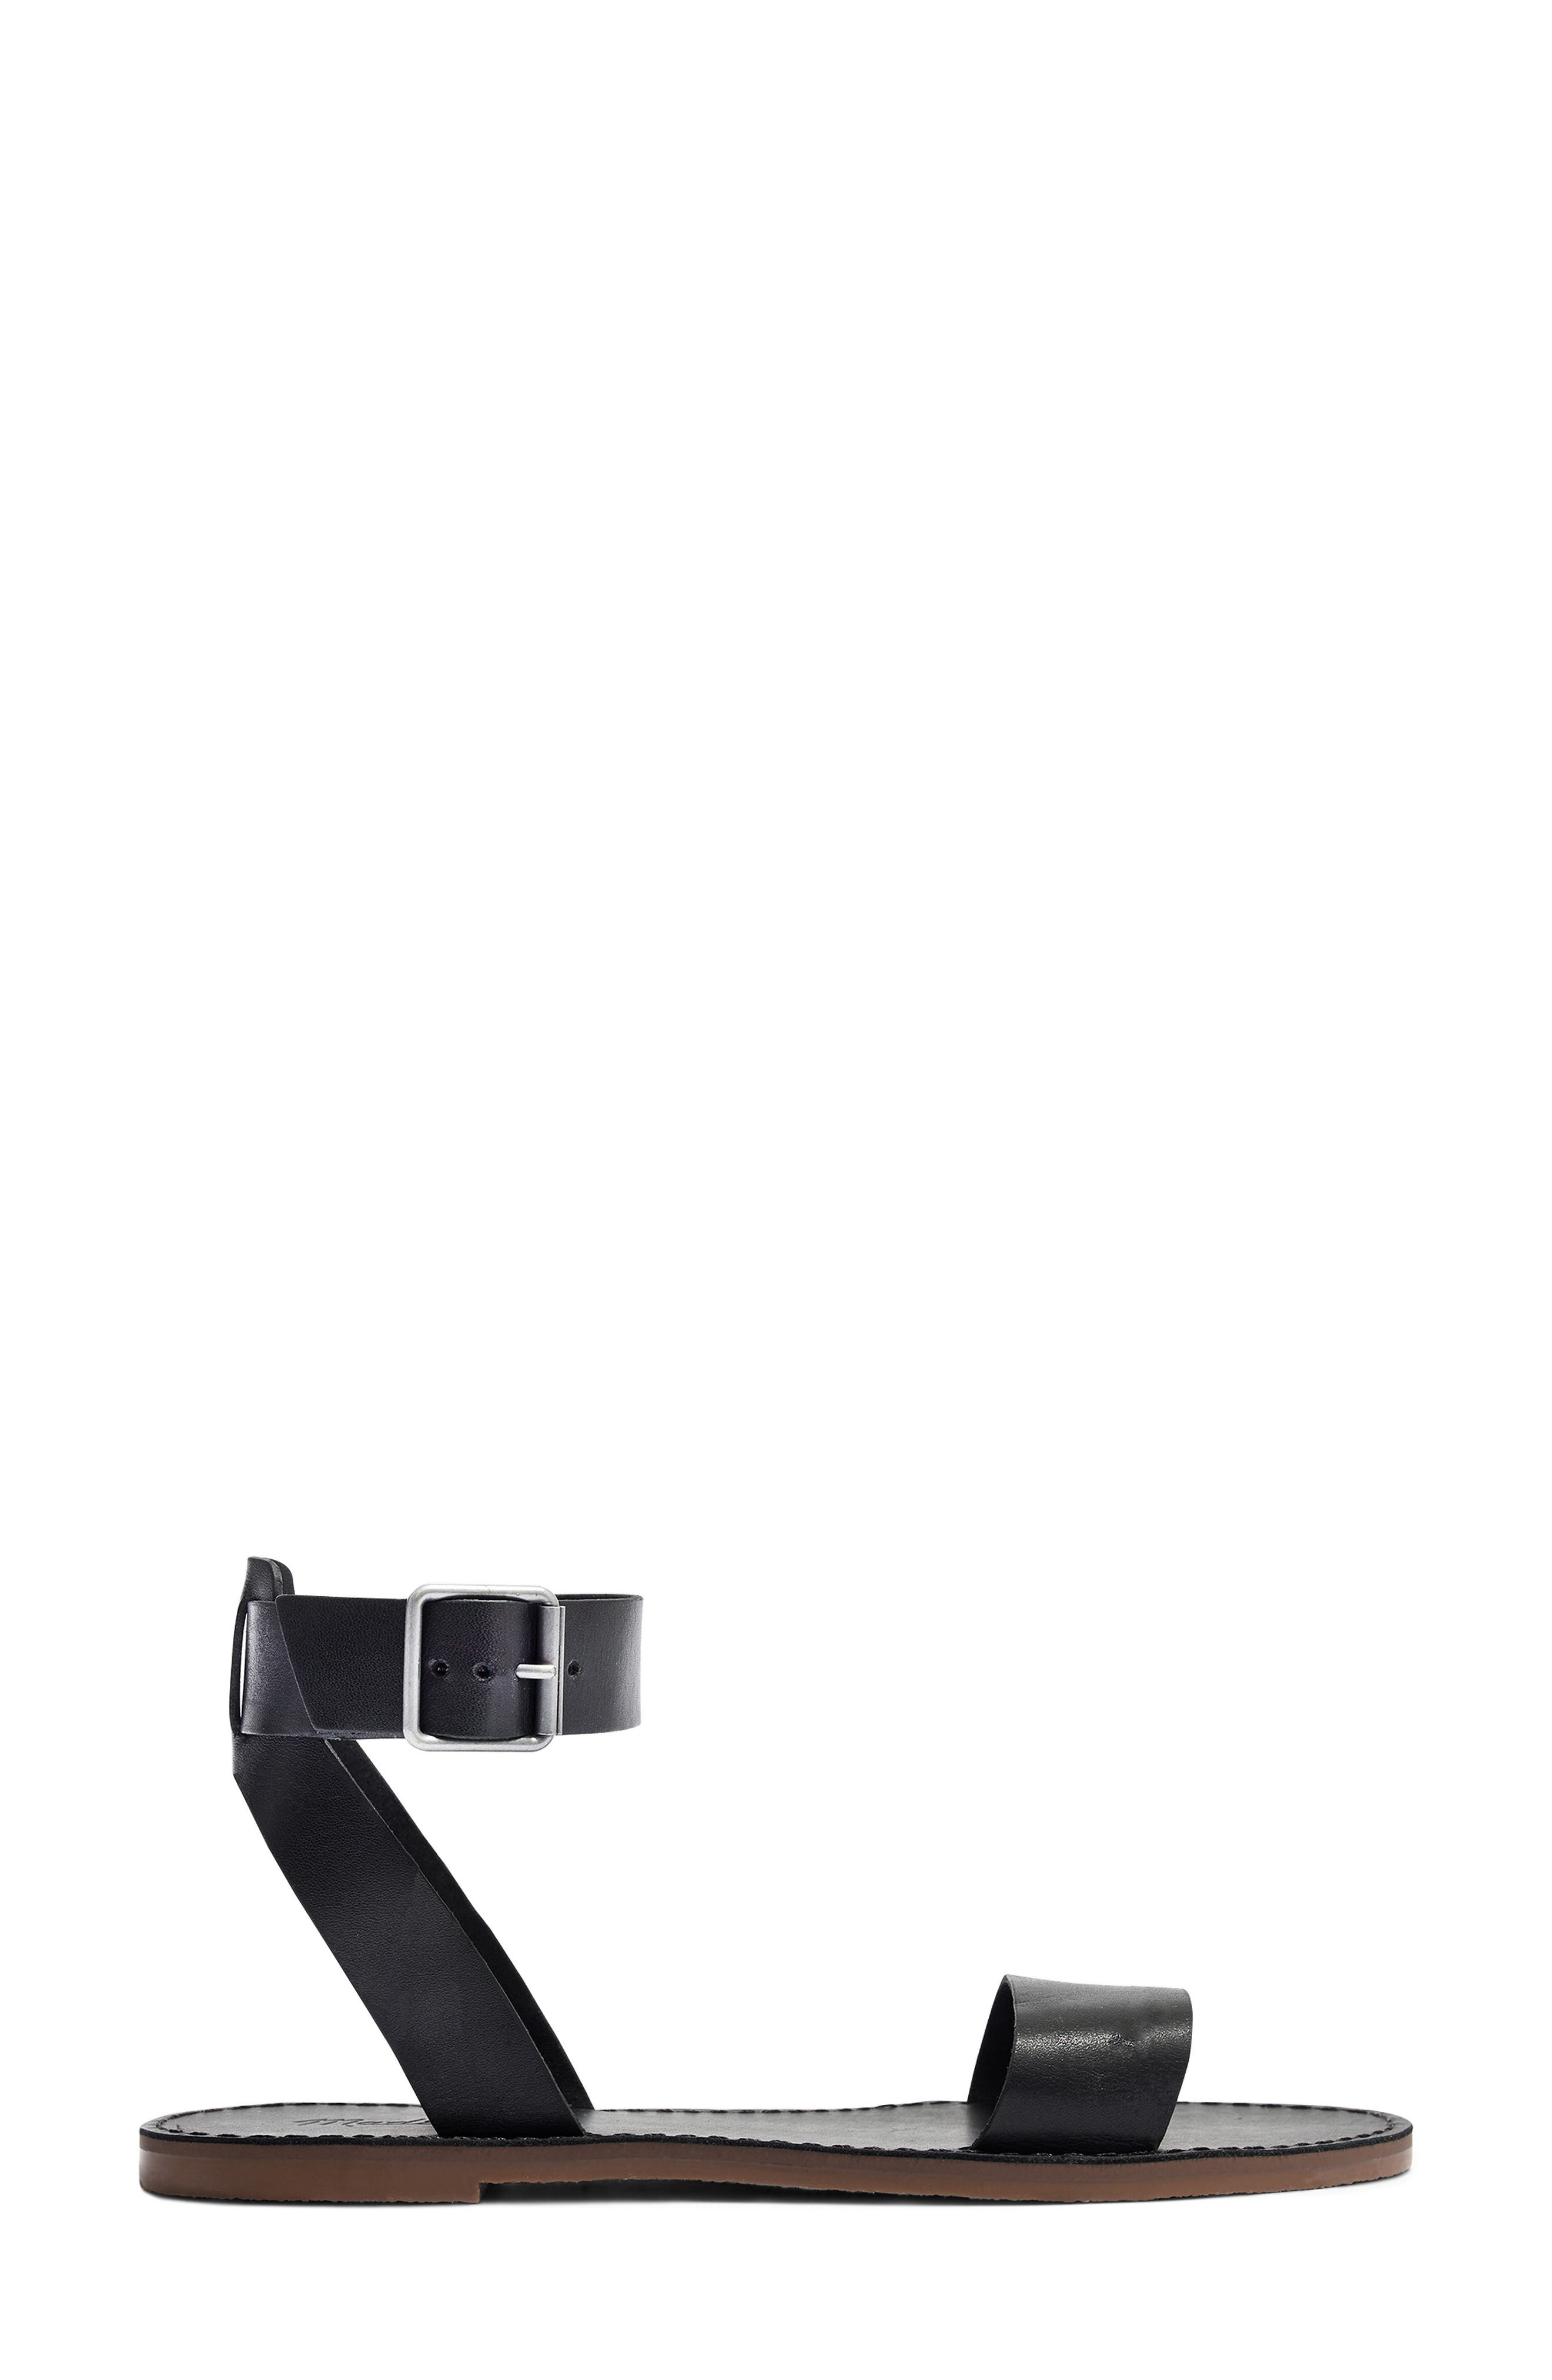 MADEWELL,                             The Boardwalk Ankle Strap Sandal,                             Alternate thumbnail 3, color,                             TRUE BLACK LEATHER